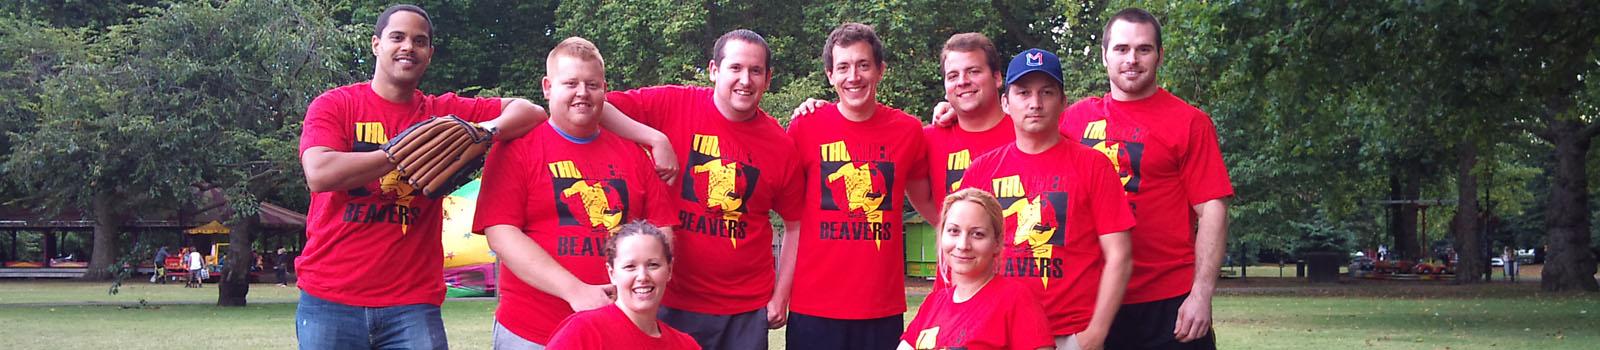 red softball team 350